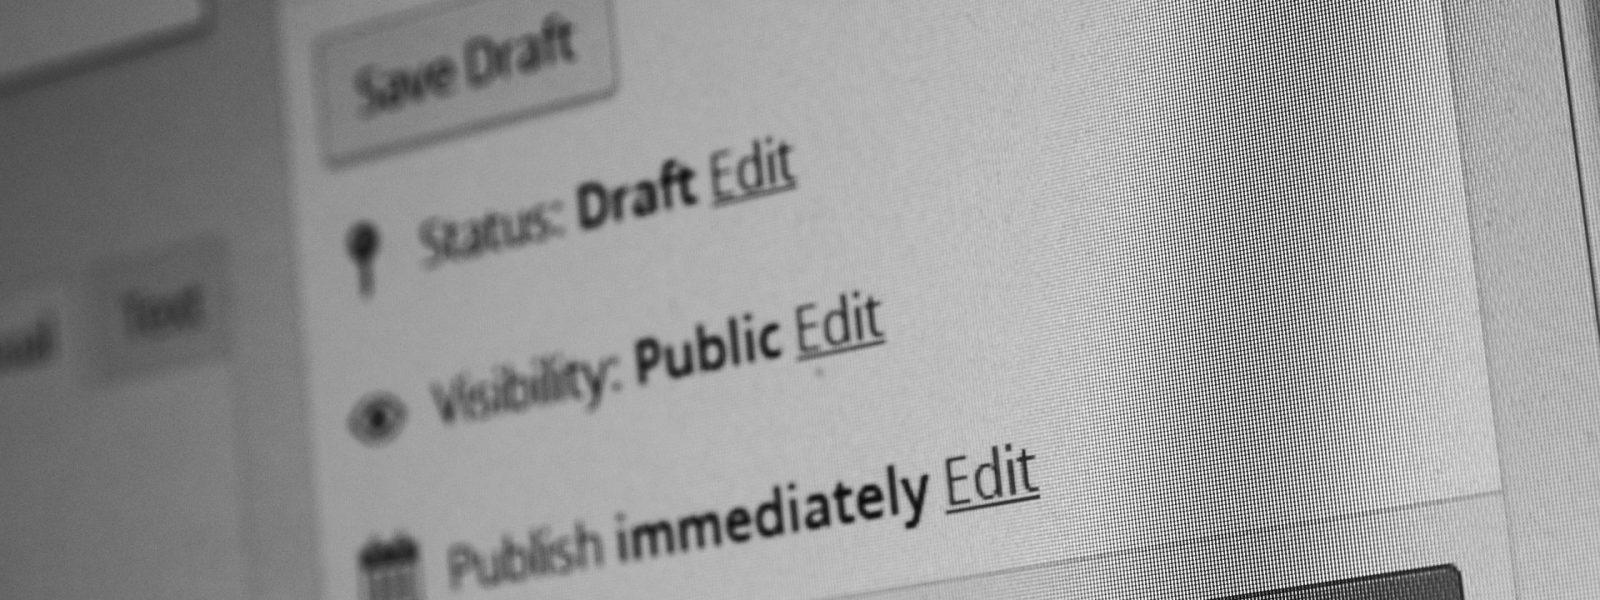 Wordpress website content publish